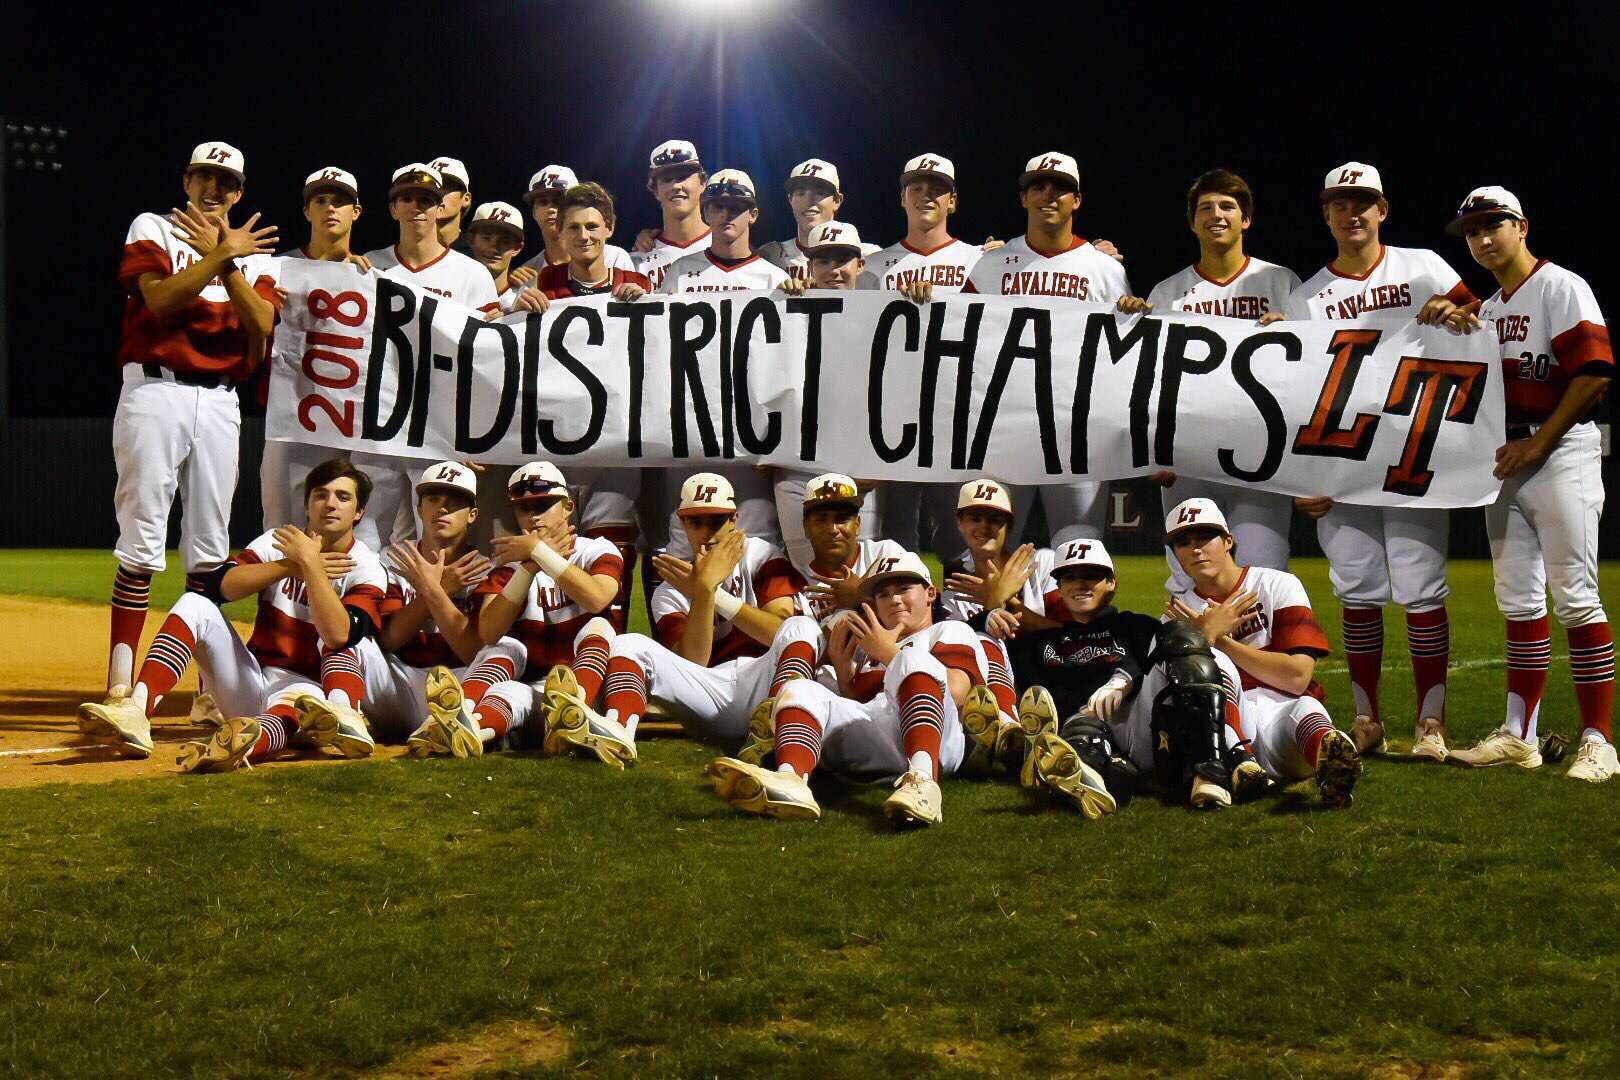 LT Baseball 2018 District Champ